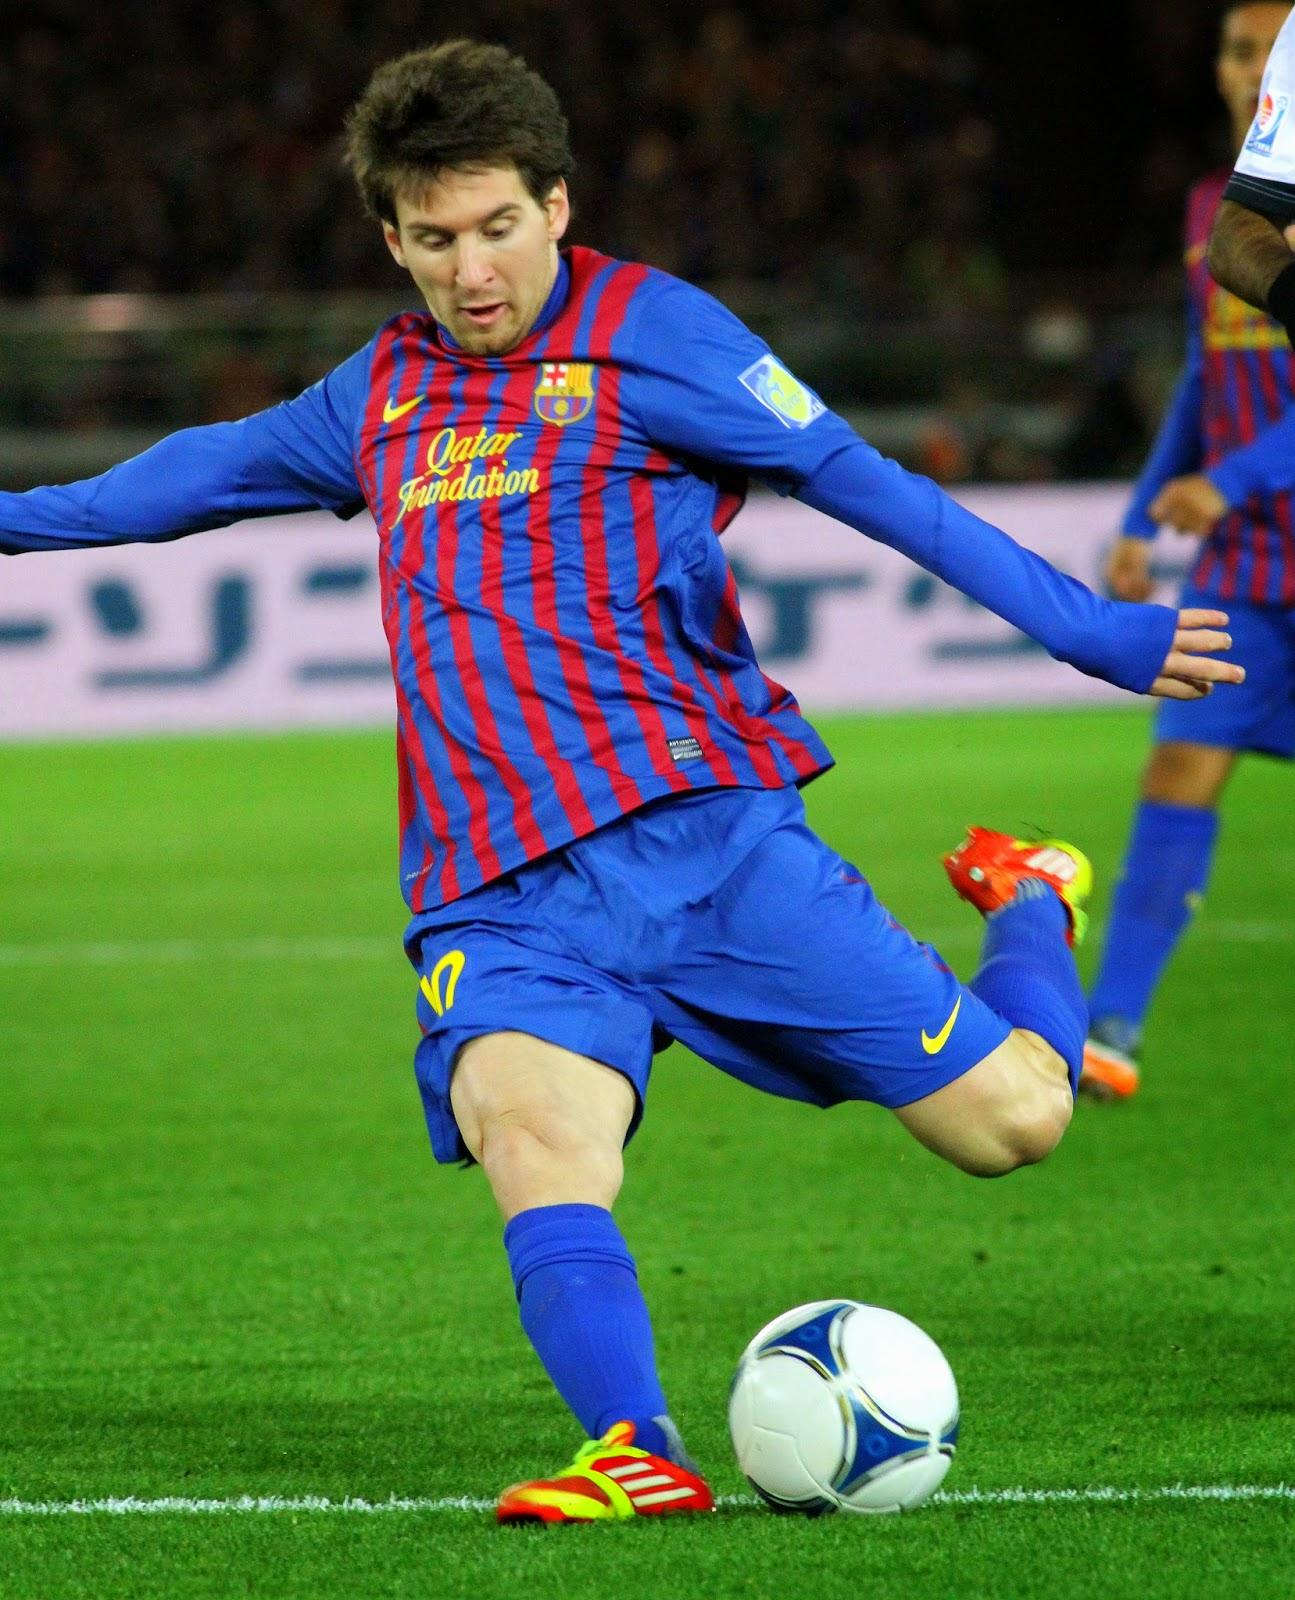 Lionel Messi Full HD Wallpapers 2016 Encarles Wallpaper 1295x1600